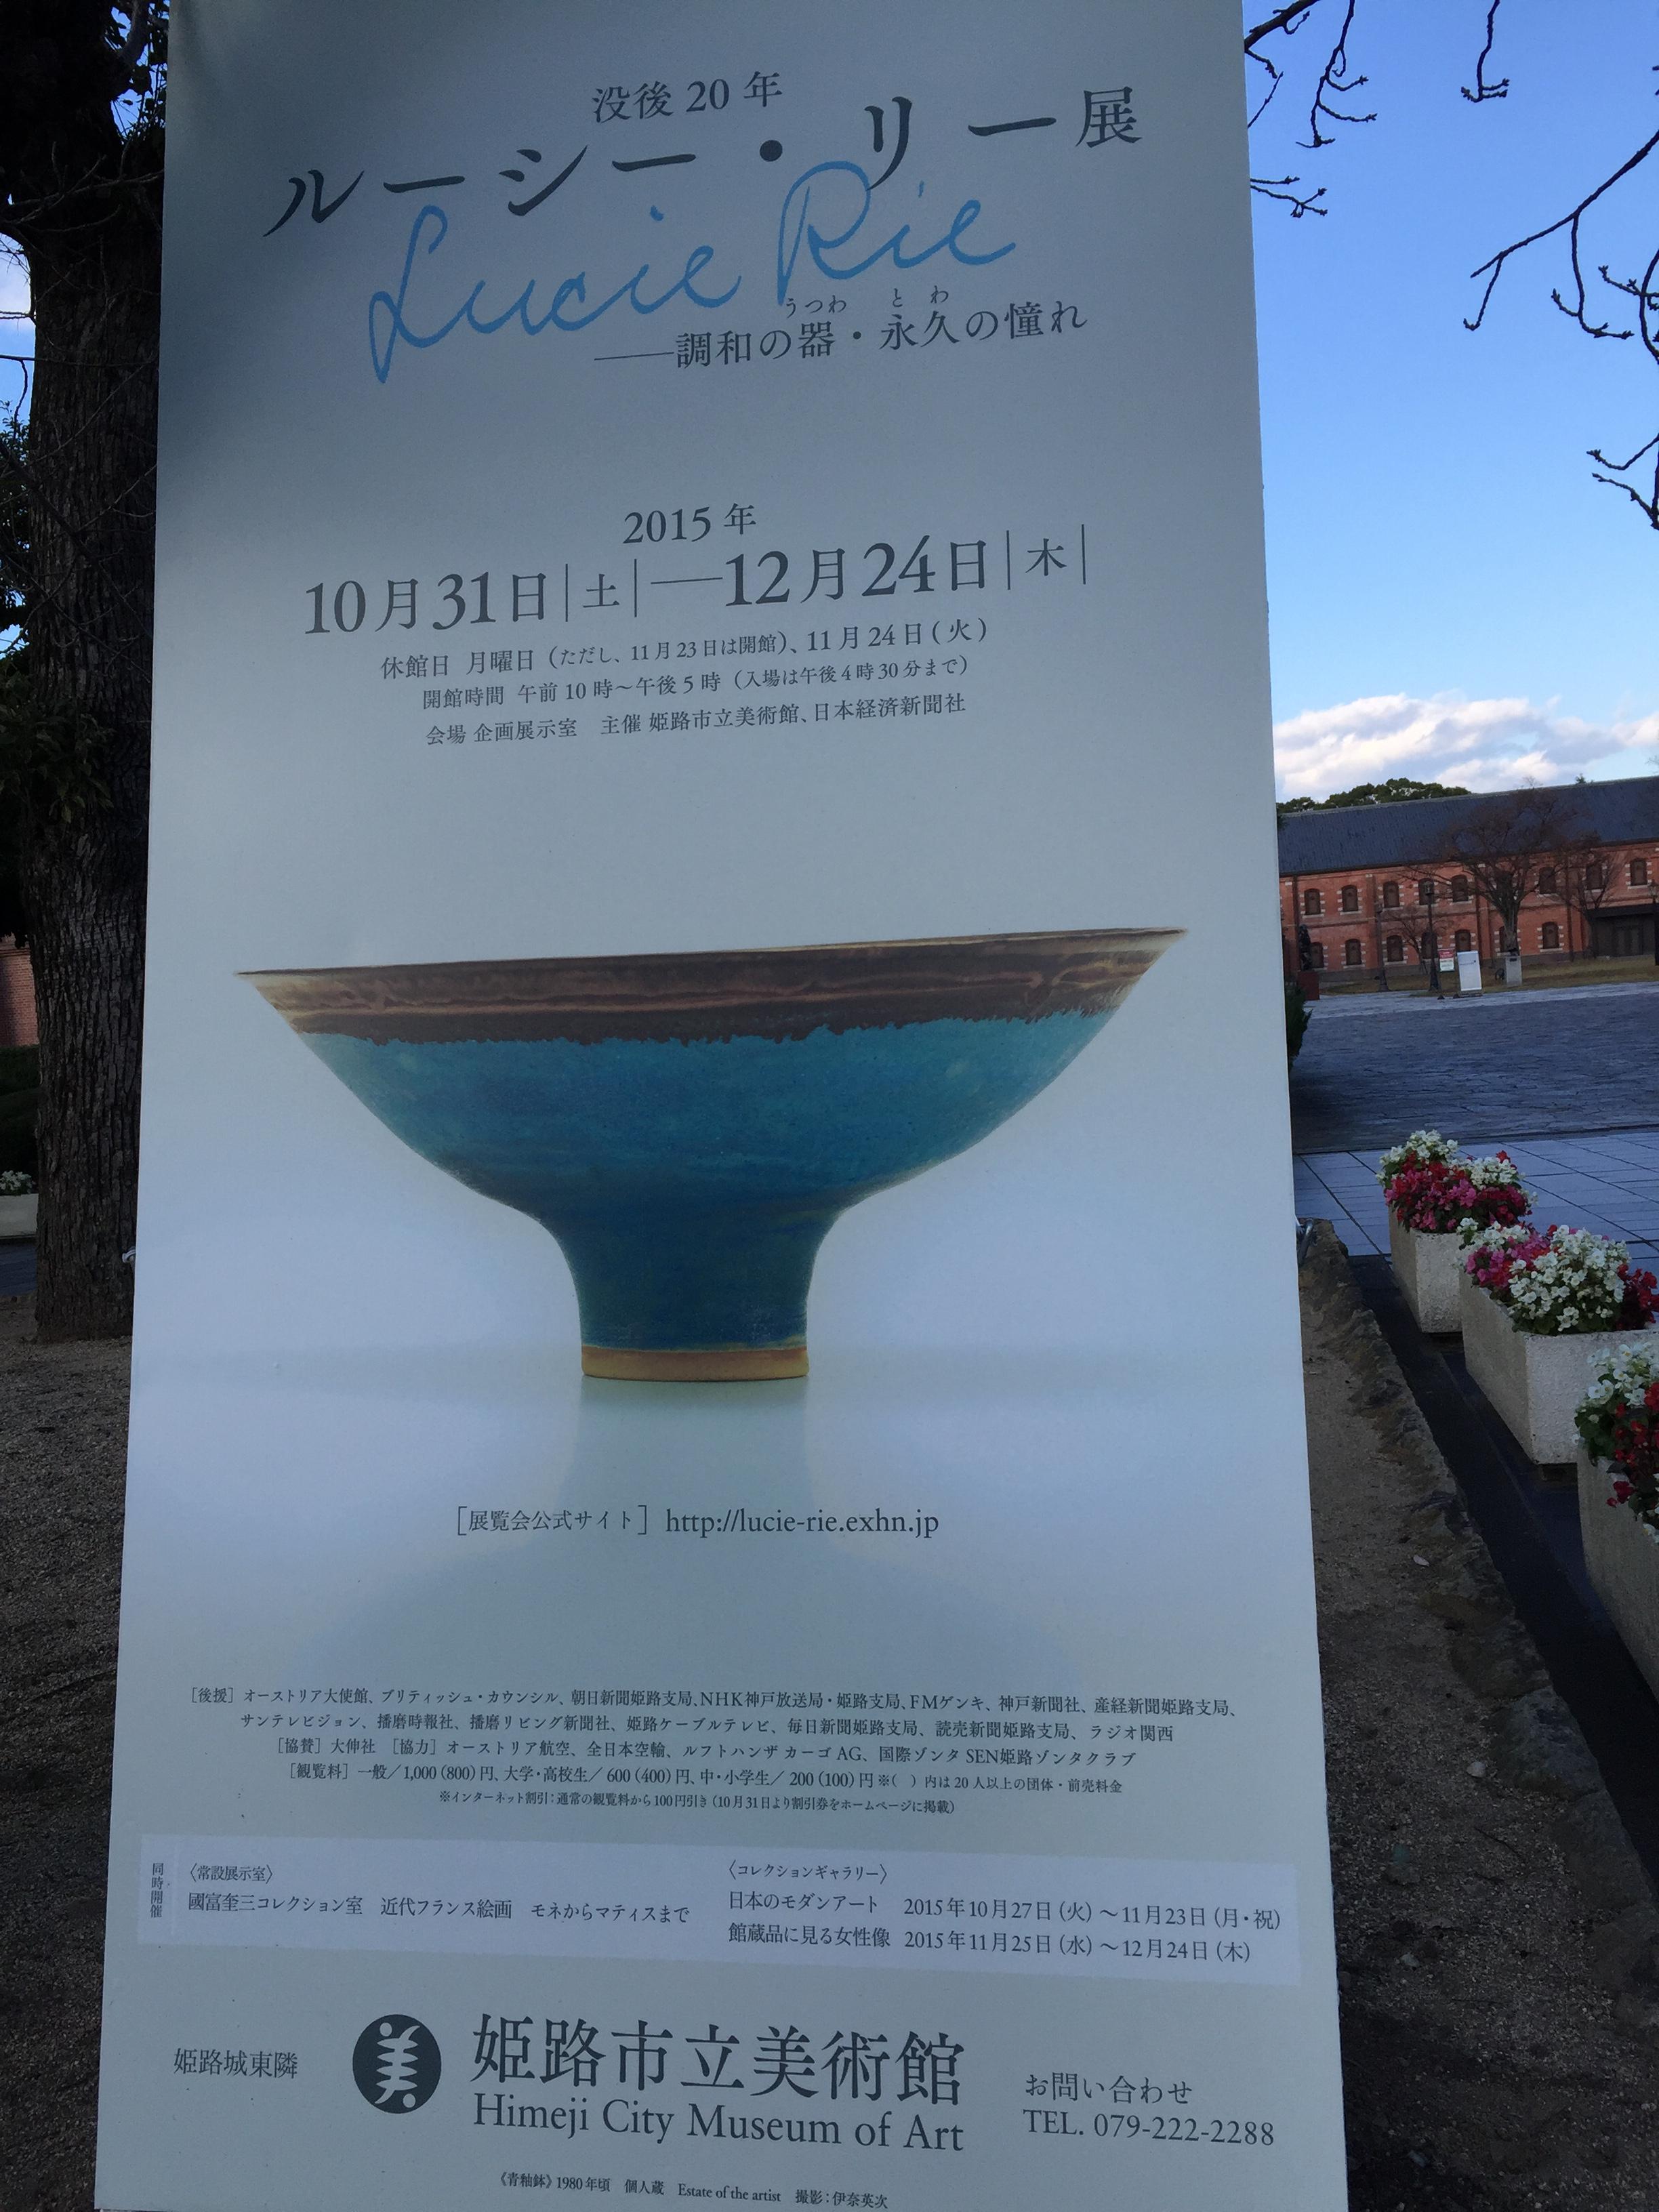 2015-11-27 15.34.06